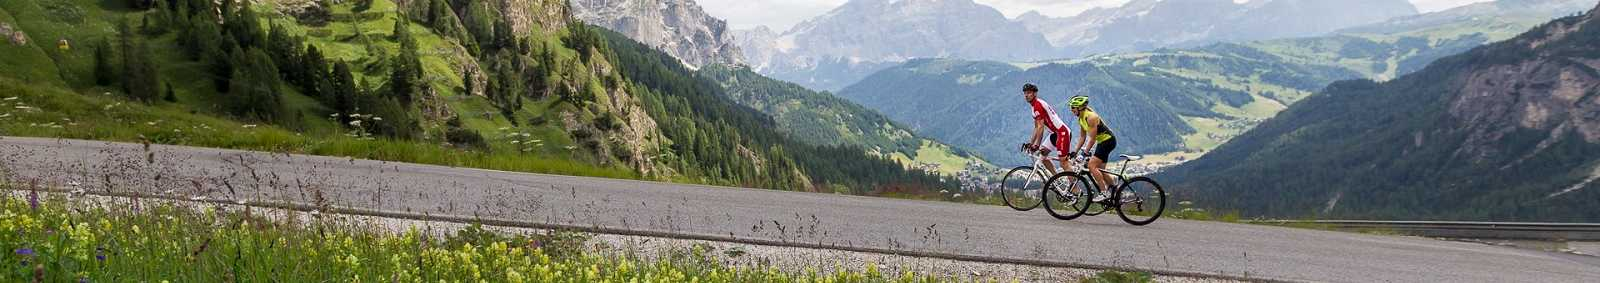 Cycling through the alps